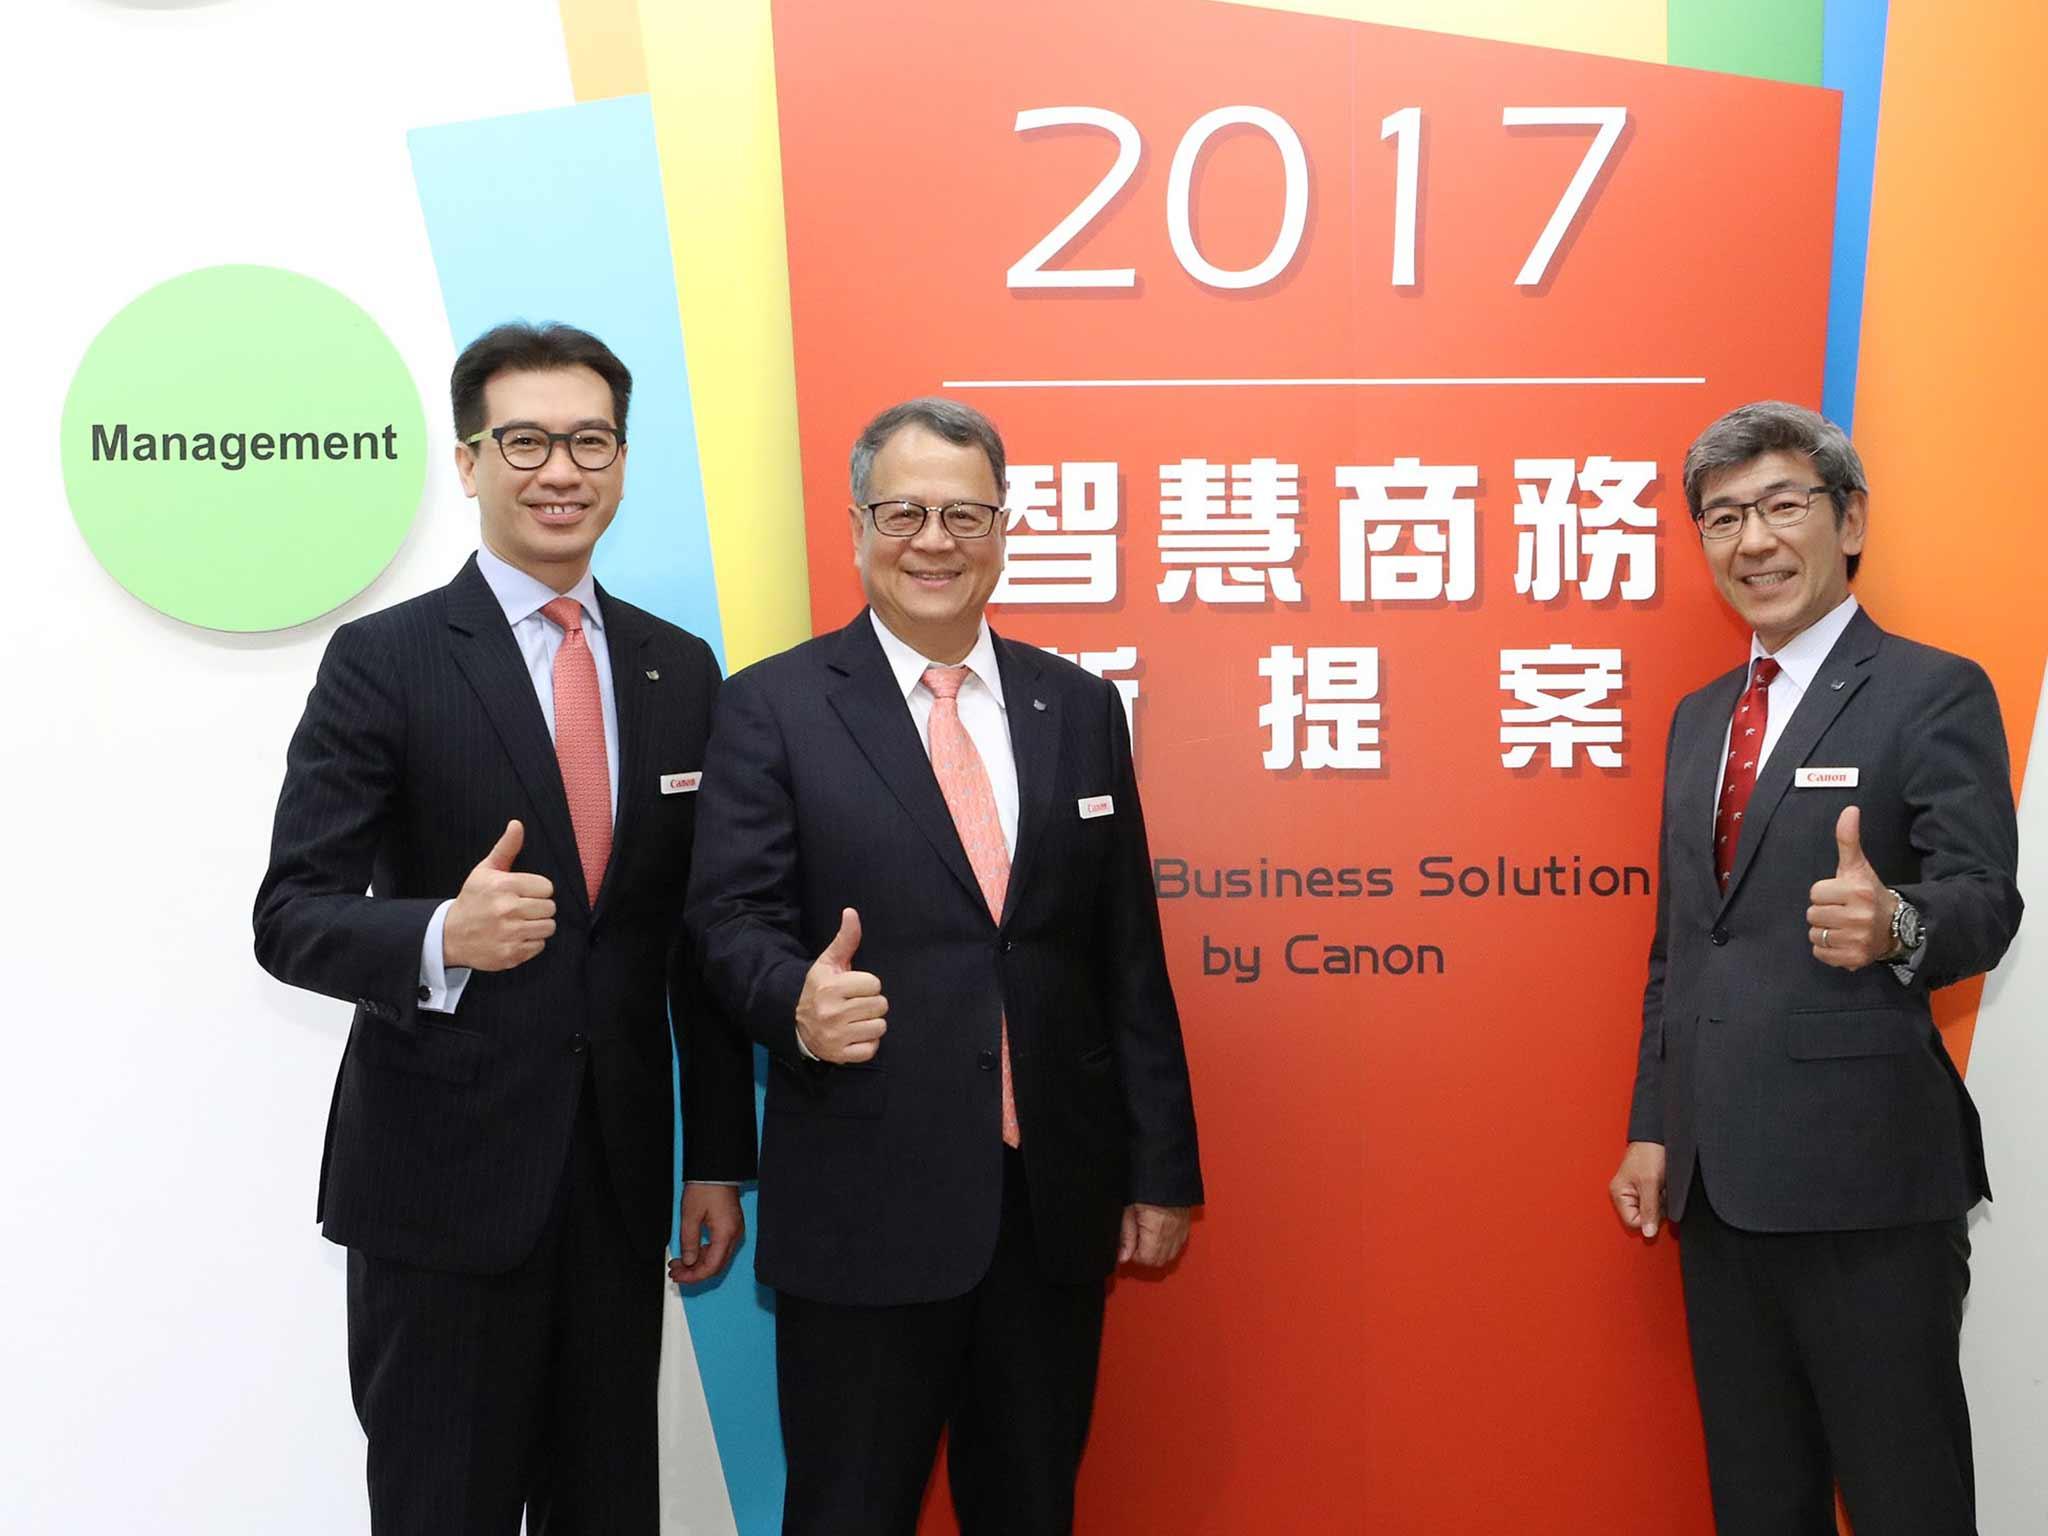 Canon 推出「智慧商務新提案」 積極拓展 B2B 商用市場